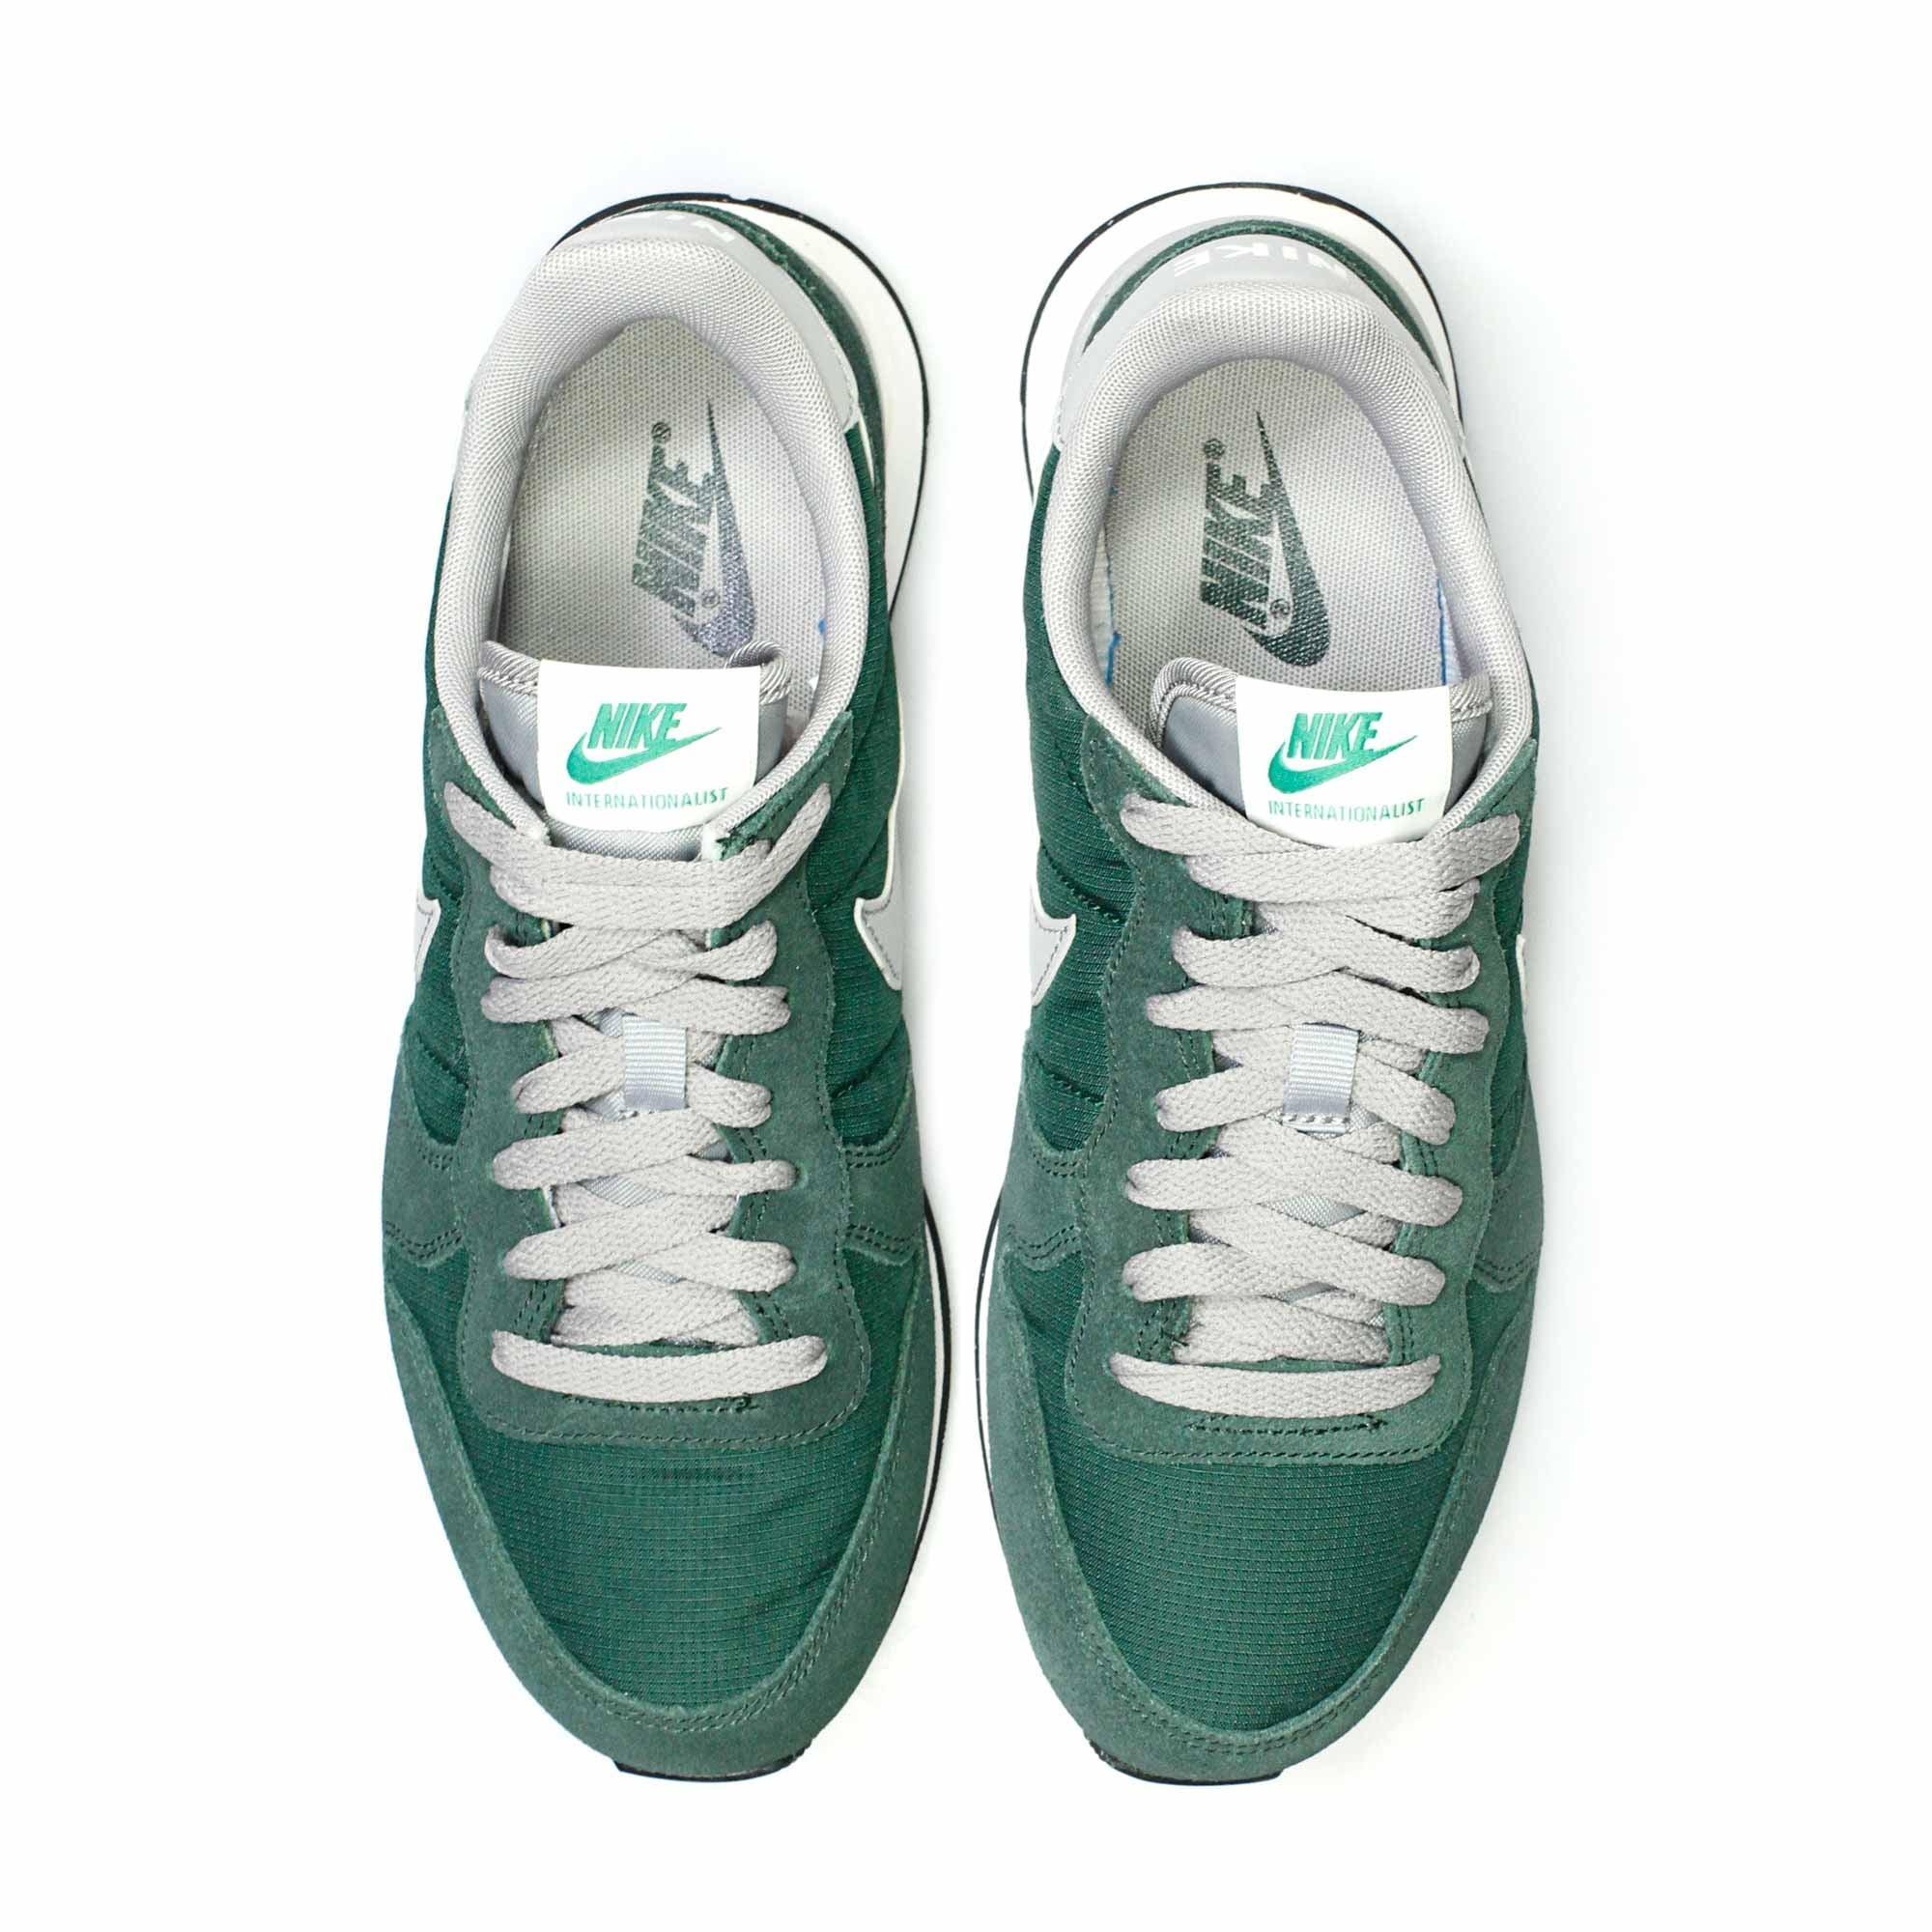 4c89ecaae2a4 Lyst - Nike Internationalist Gorge Green Shoe 828041 in Green for Men